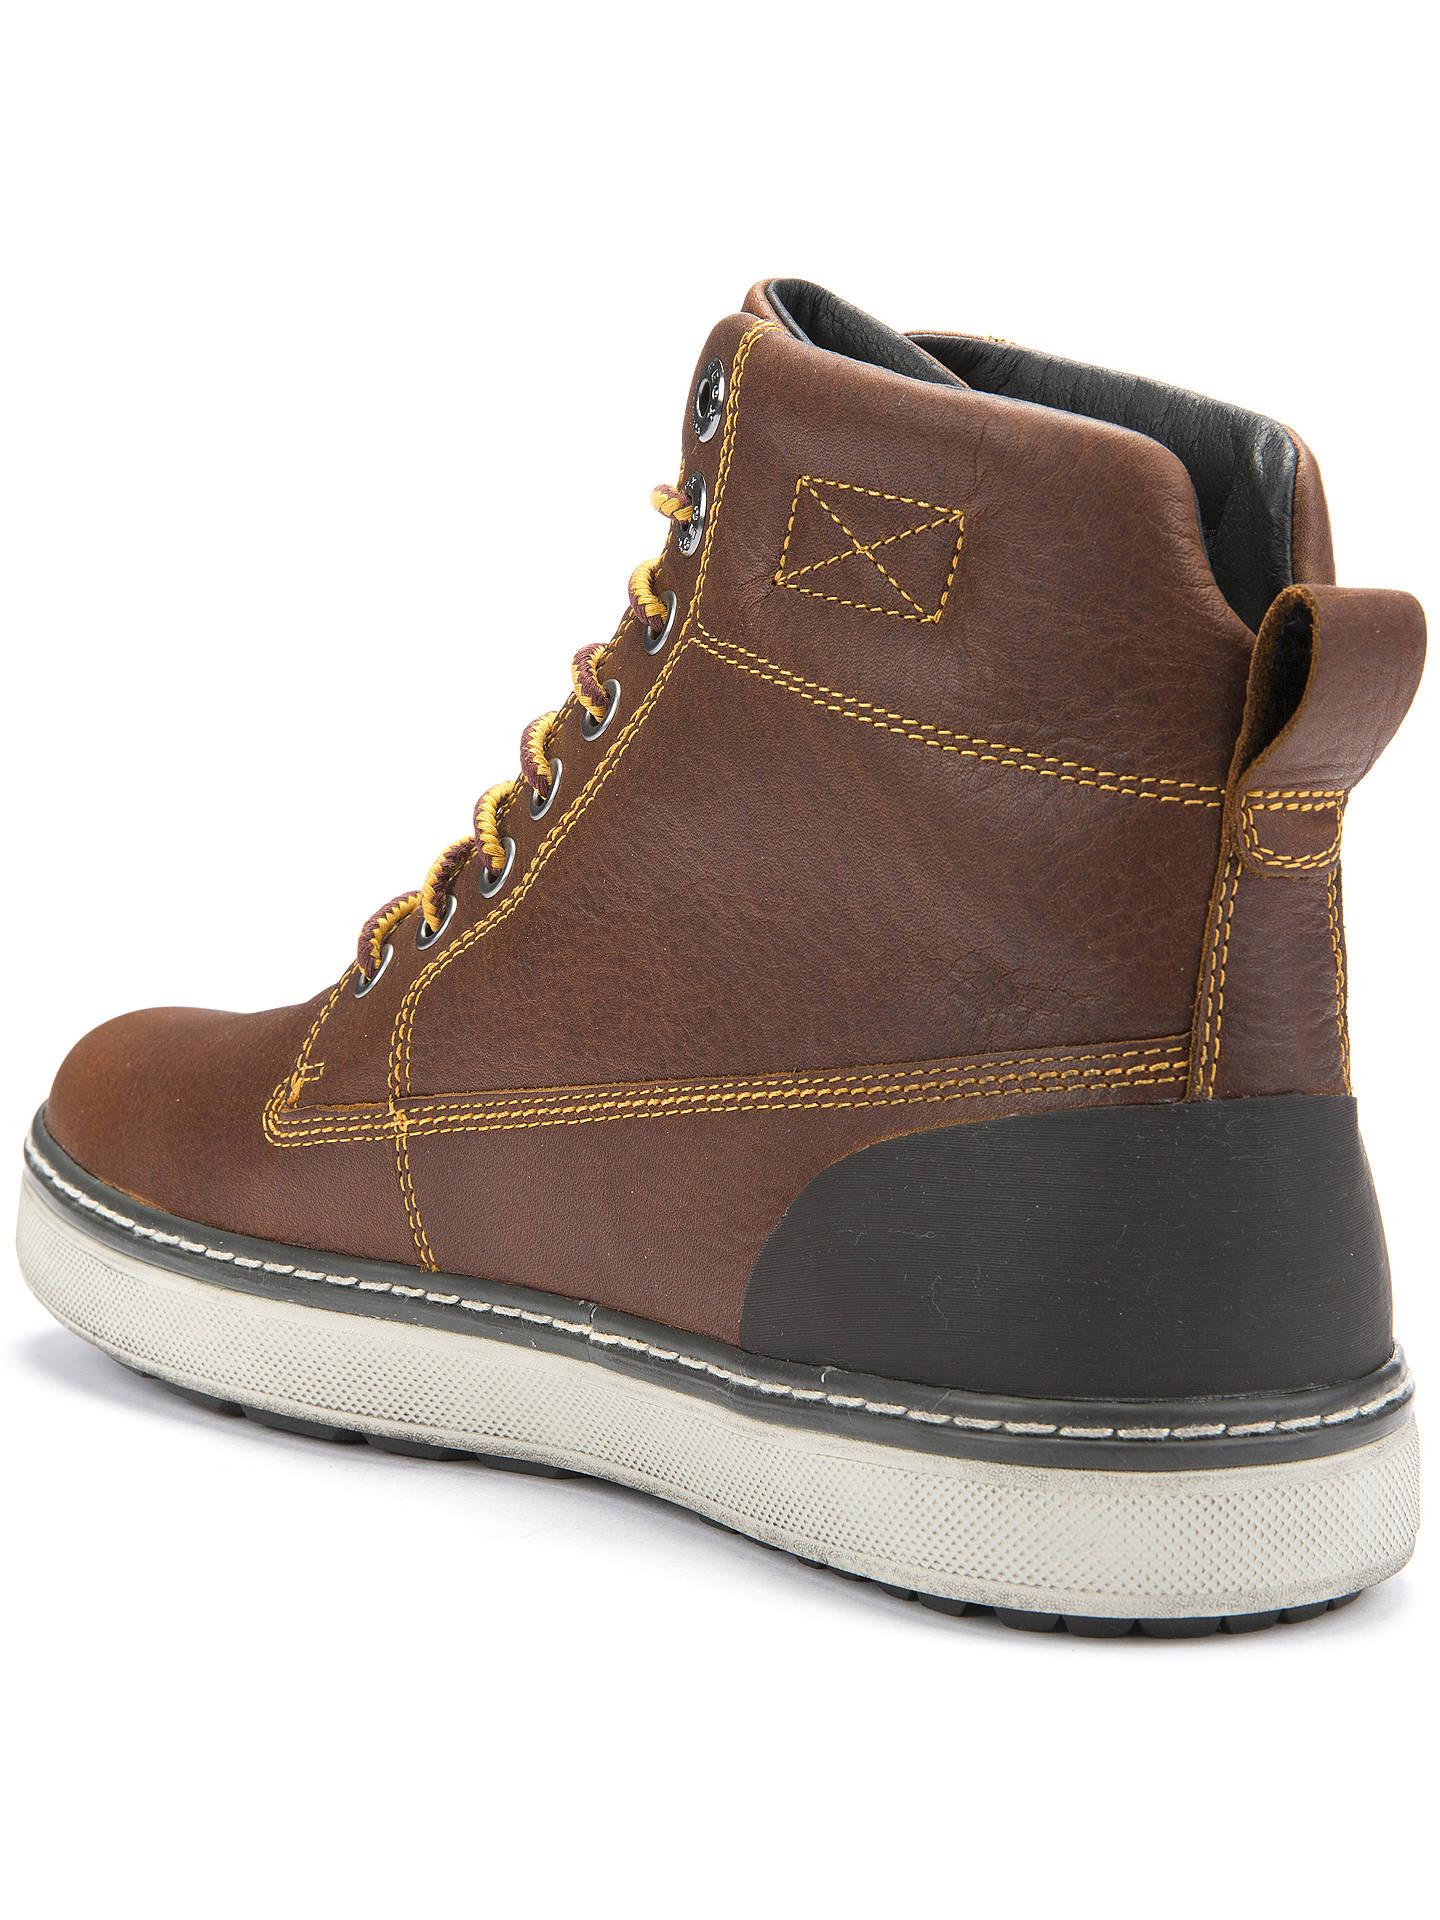 Ilustrar Ceder Anual  Geox Mattias Amphibiox Lace-Up Boots, Brown at John Lewis & Partners